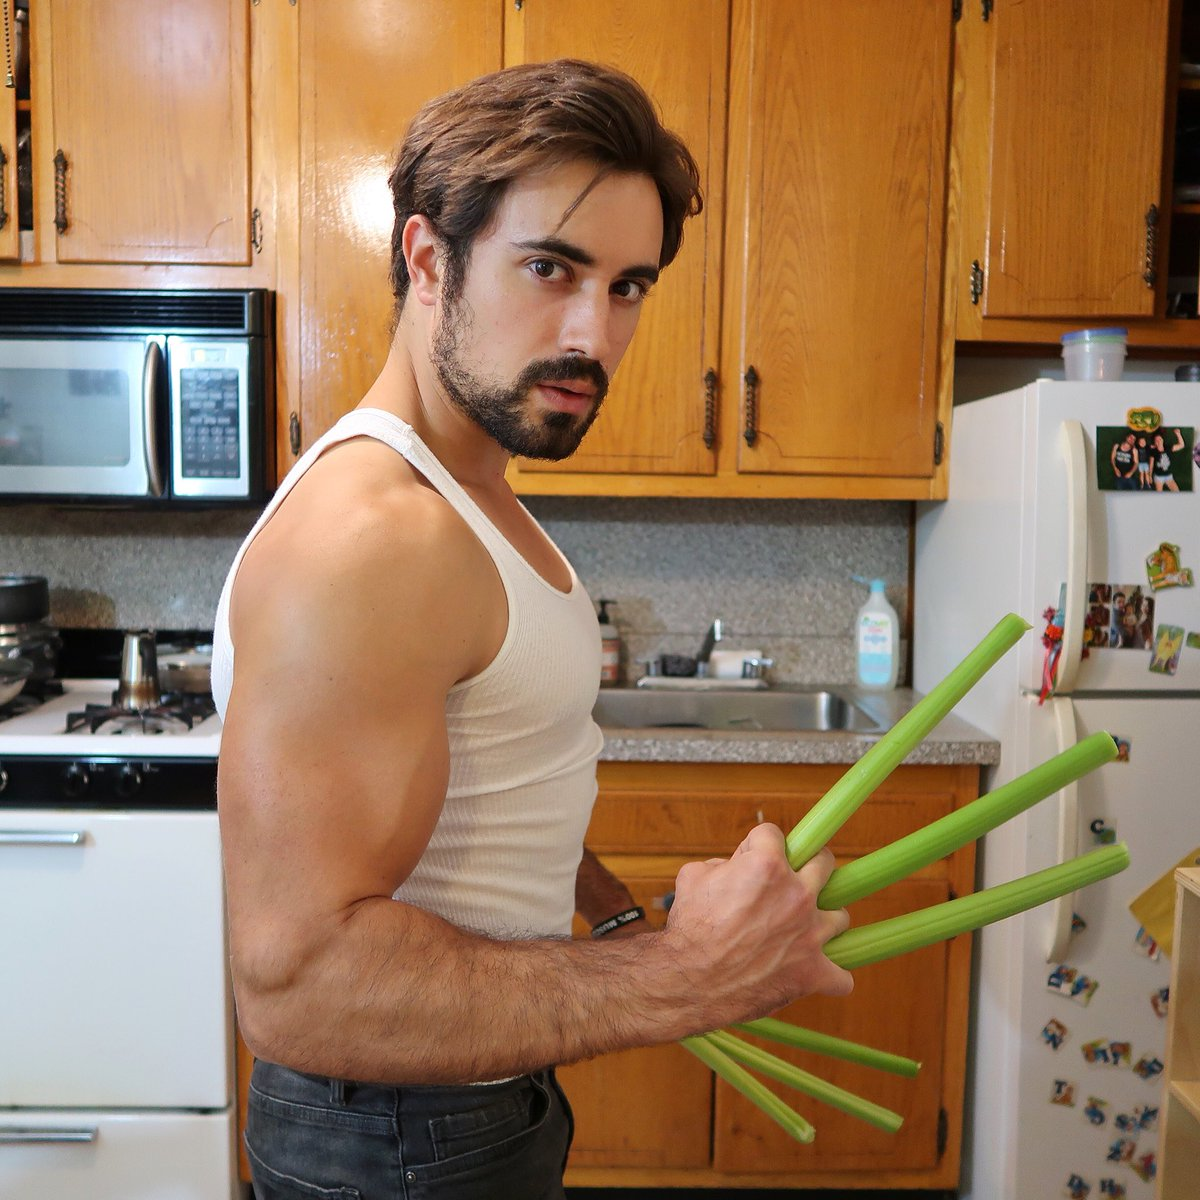 If #wolverine was #vegan  #govegan #plantbased #muscle #friendsnotfood #marvel #veganaf #crueltyfree #fit #veganfoodshare #bodybuilding<br>http://pic.twitter.com/PslG7G6XzJ